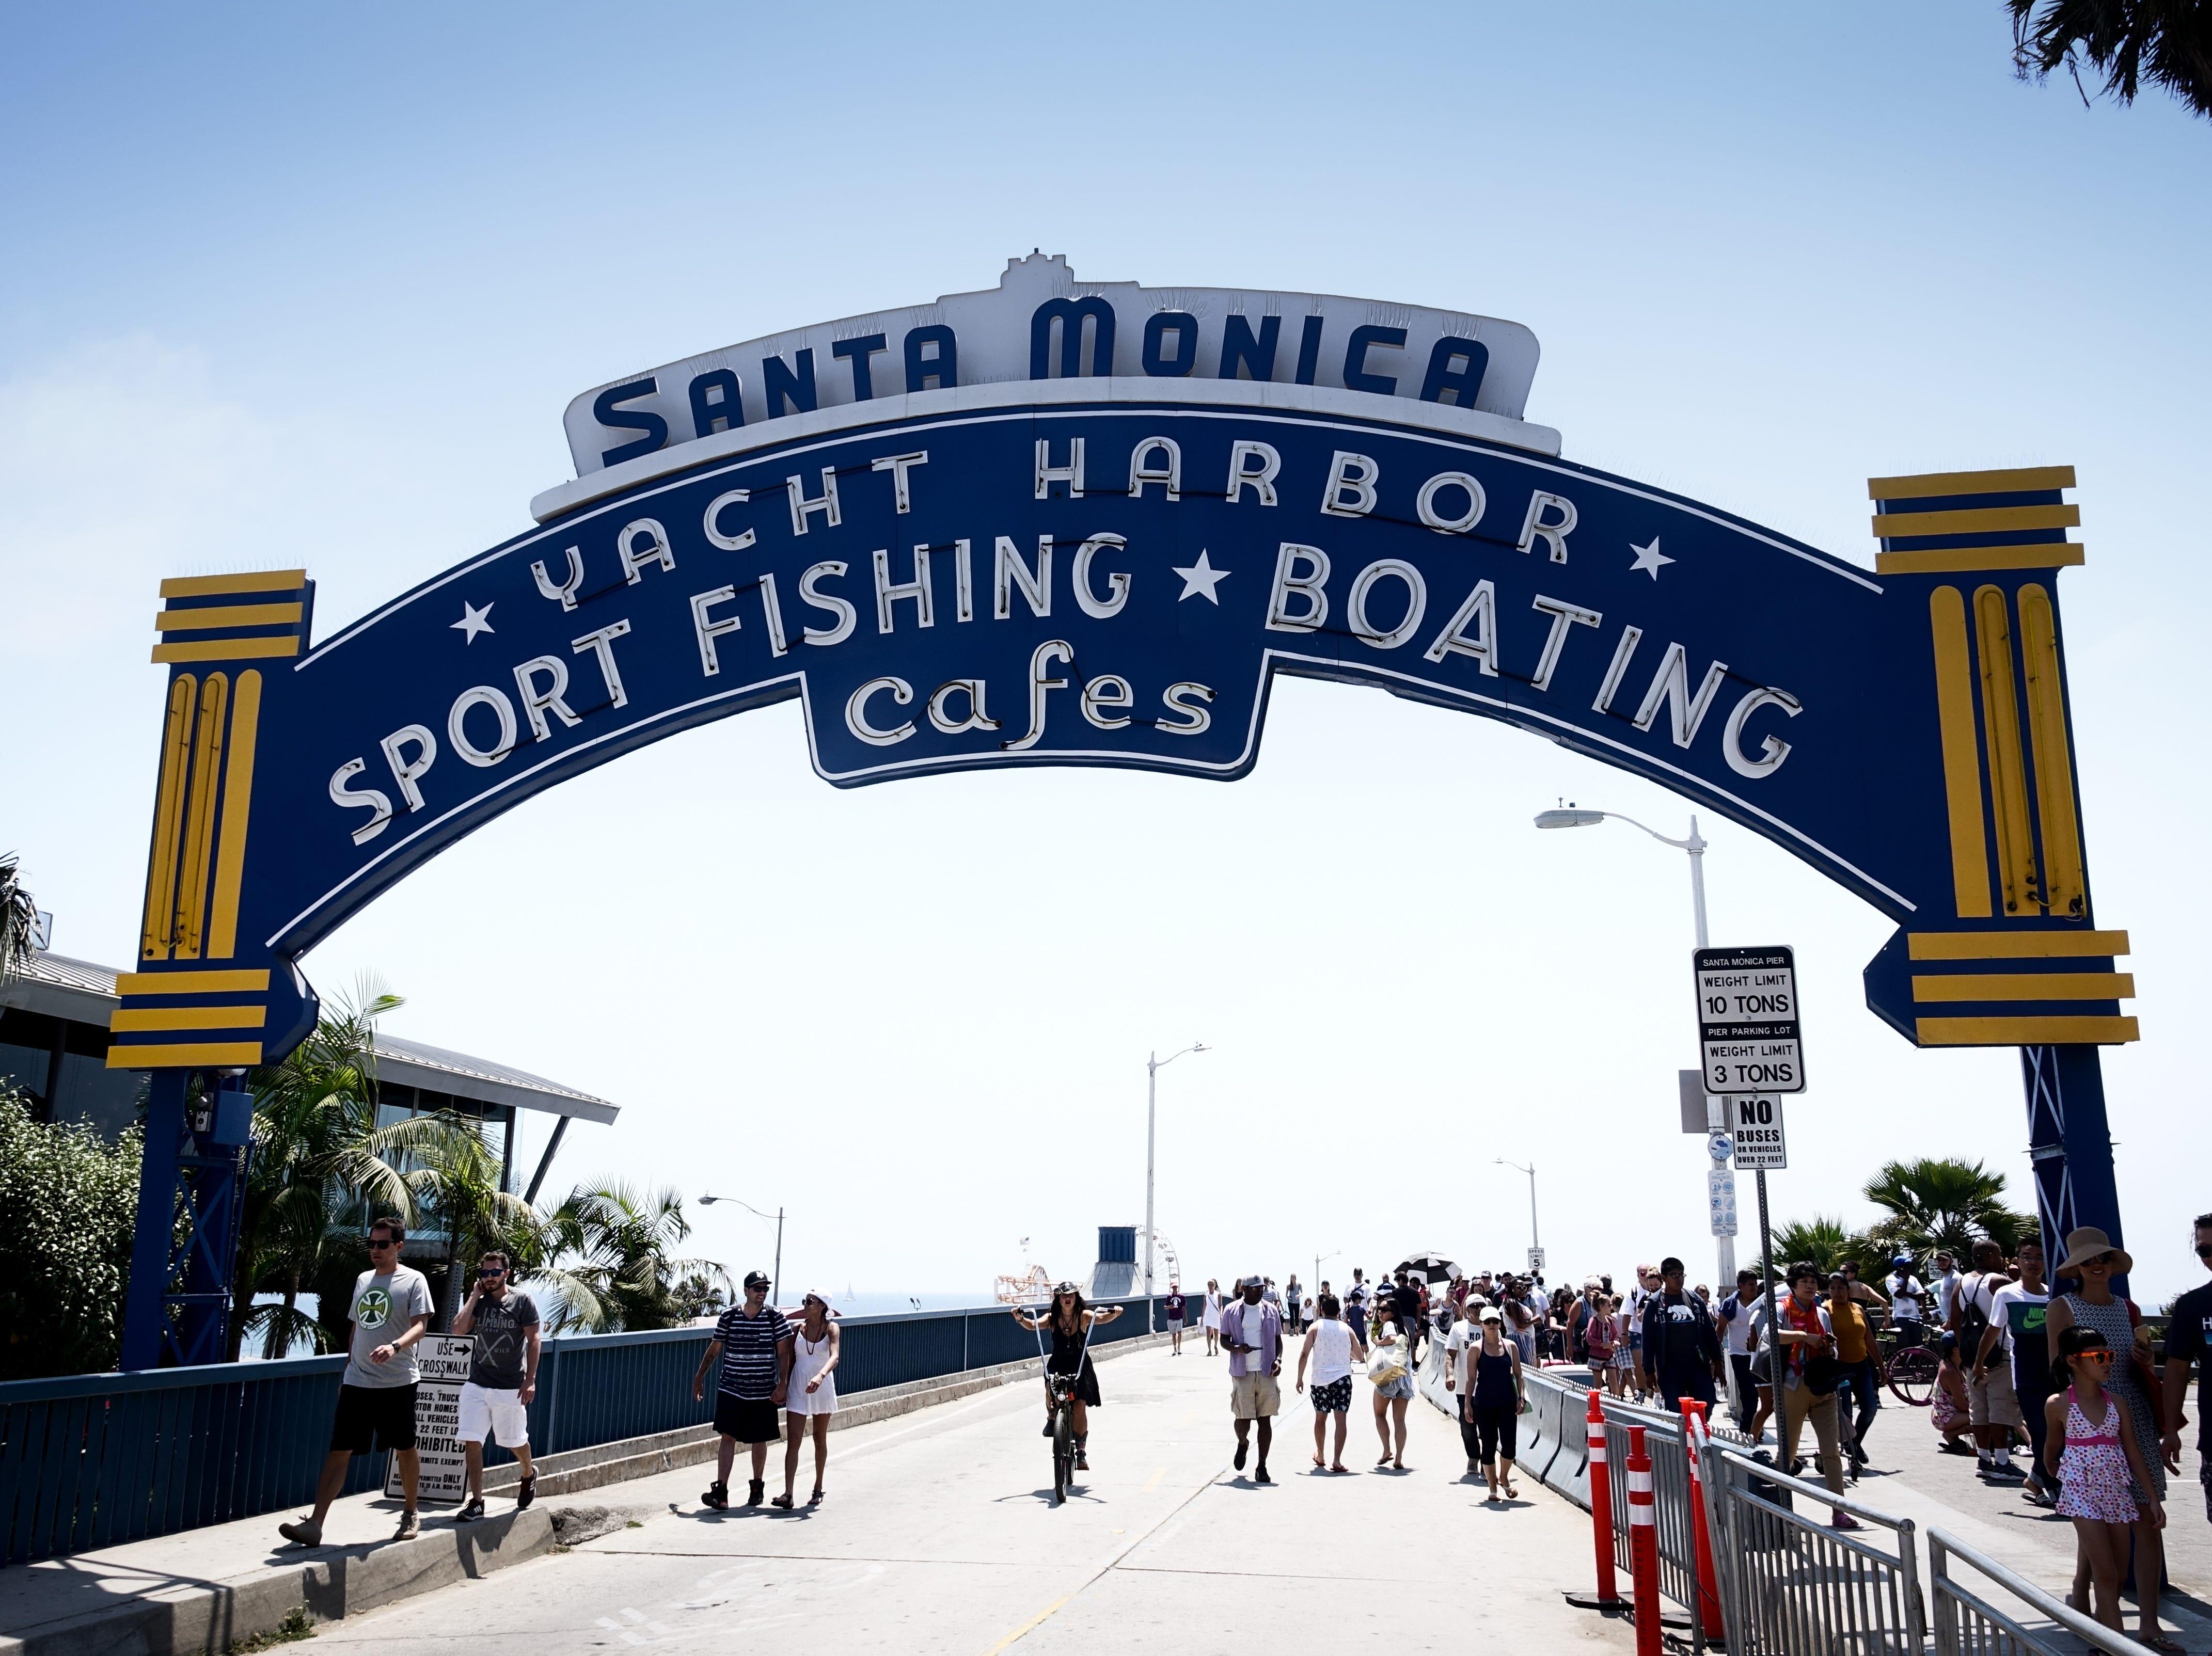 Next stop: Santa Monica and the Santa Monica Pier